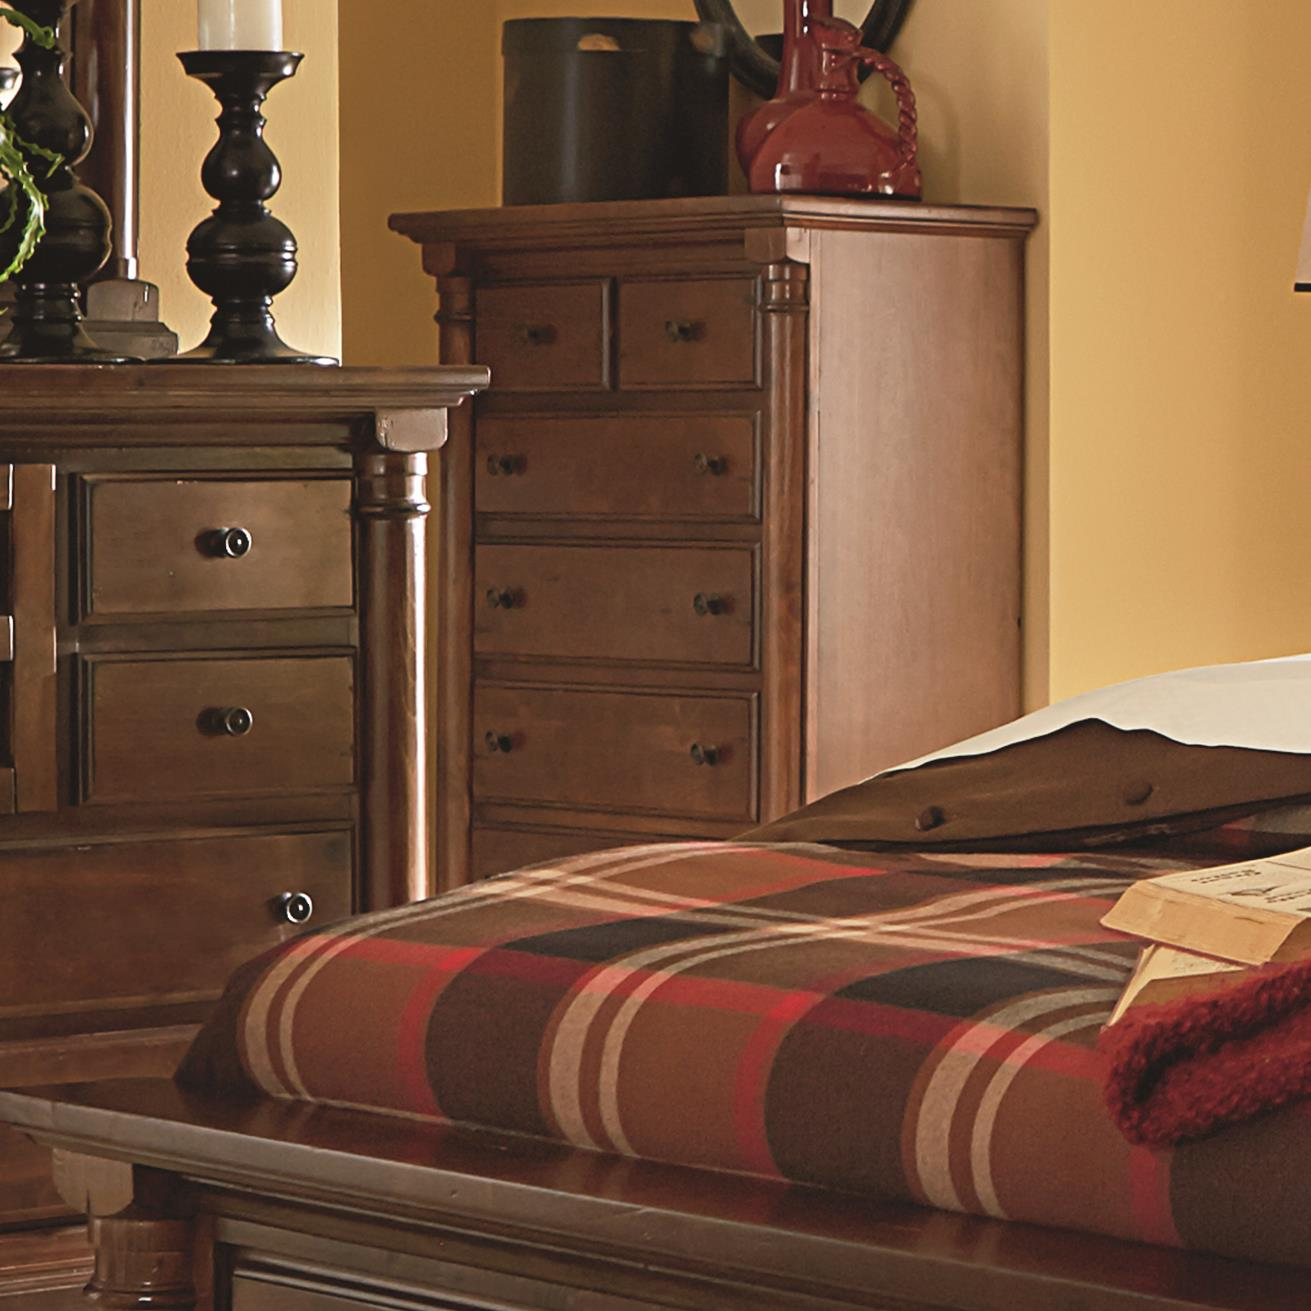 Progressive Furniture Gramercy Park Chest of Drawers - Item Number: P660-14